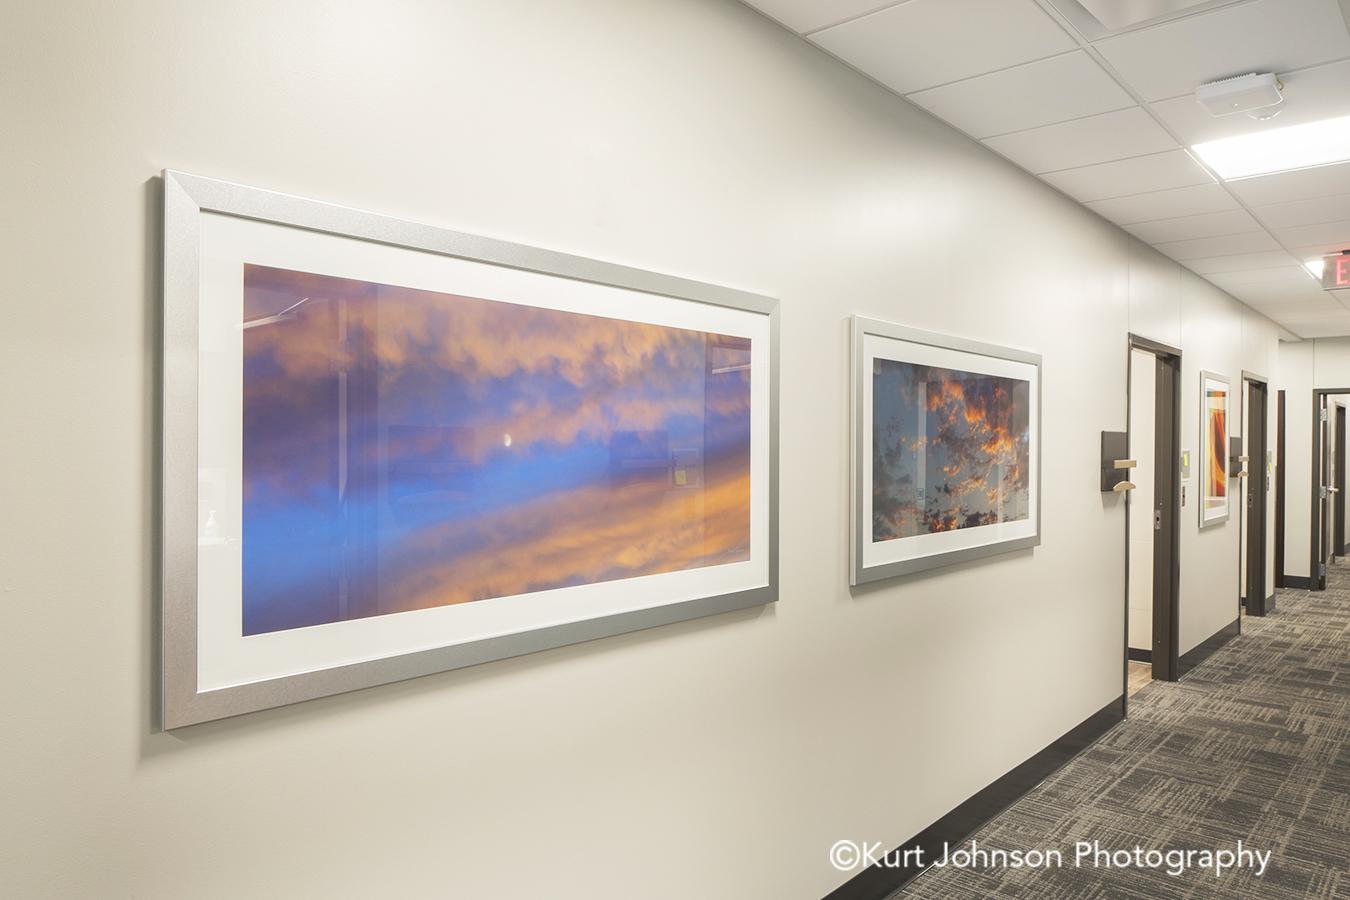 Methodist Jennie Edmundson Hospital Council Bluffs Iowa Framed Art Clouds Landscape Landscapes Sky Healthcare Installation